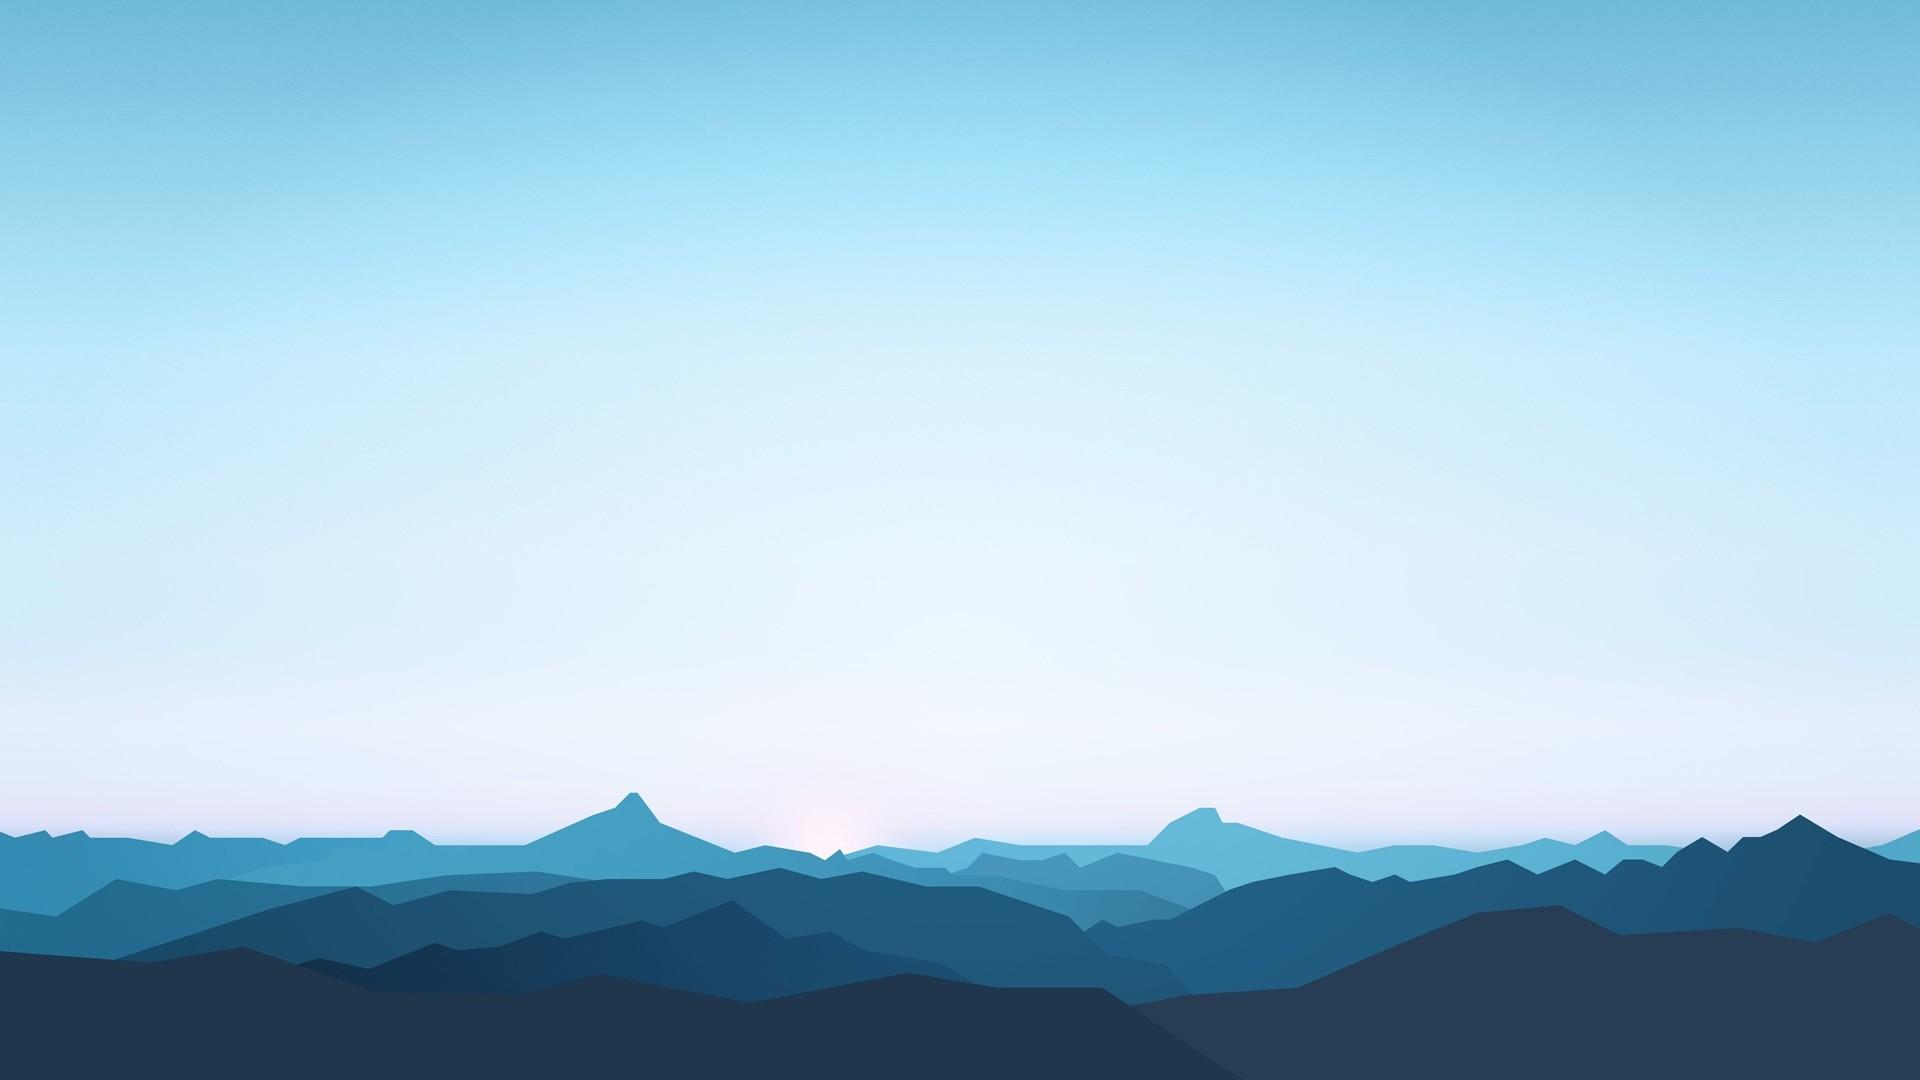 Sky Minimalist hd desktop wallpaper